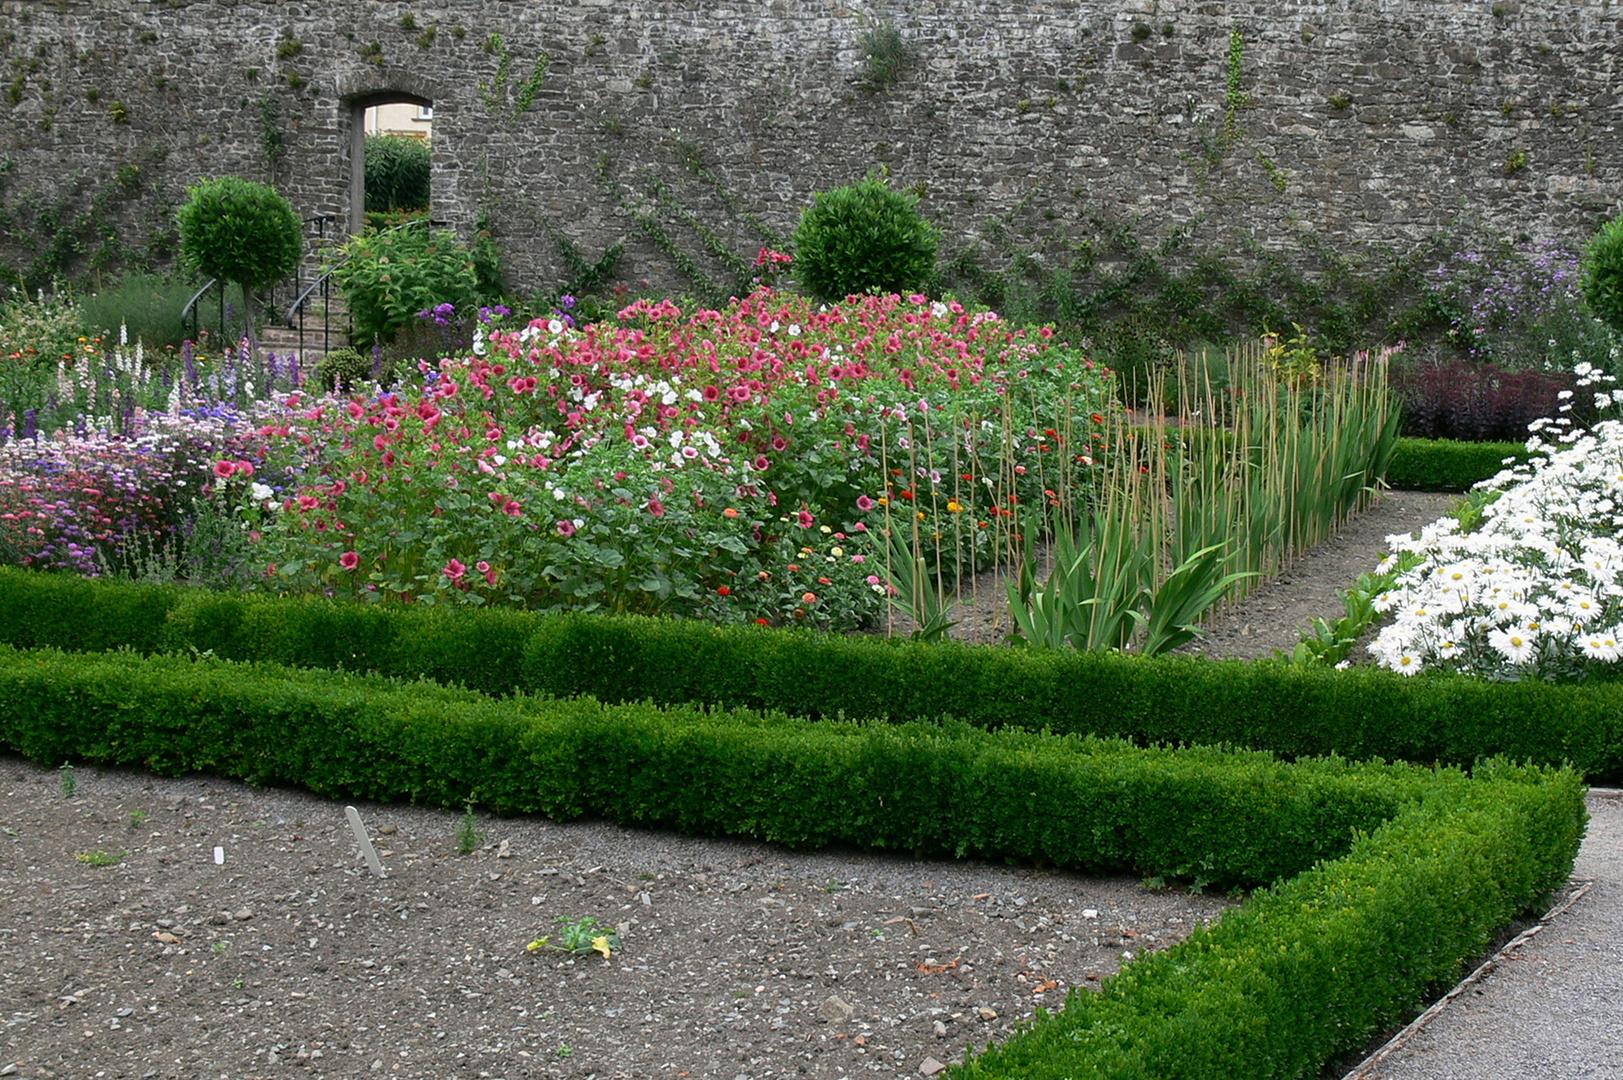 Aberglasney House and Gardens V